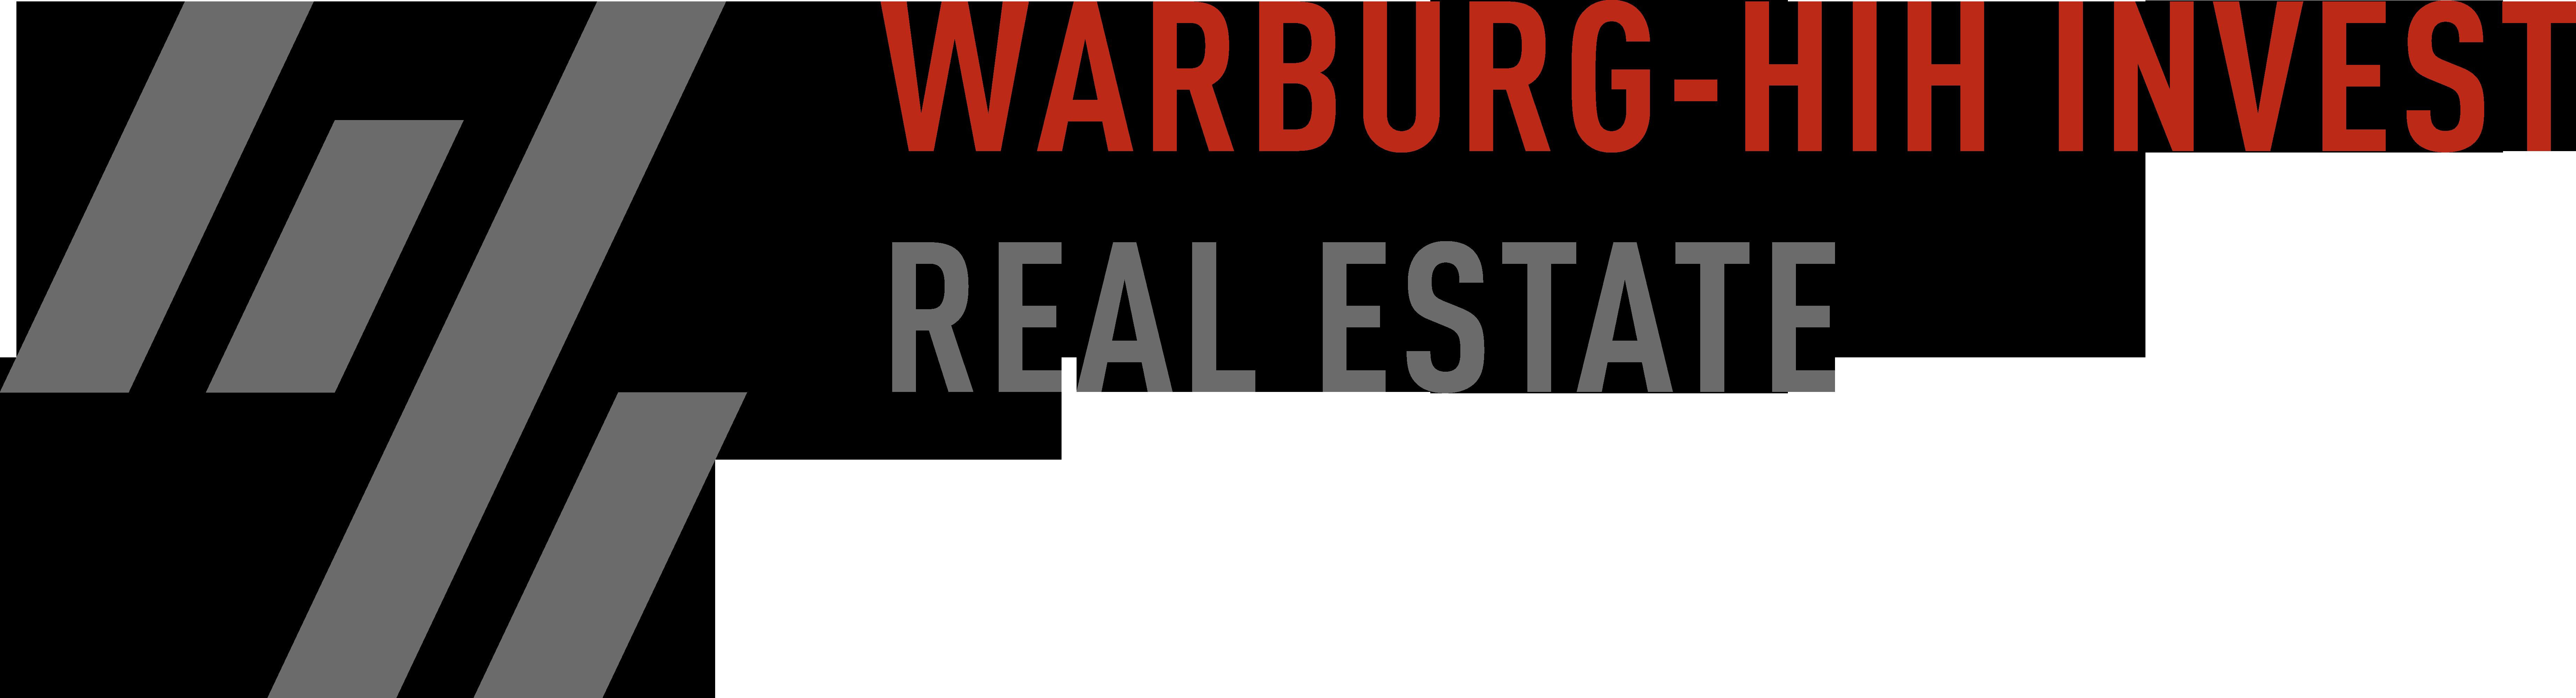 Warburg-HIH